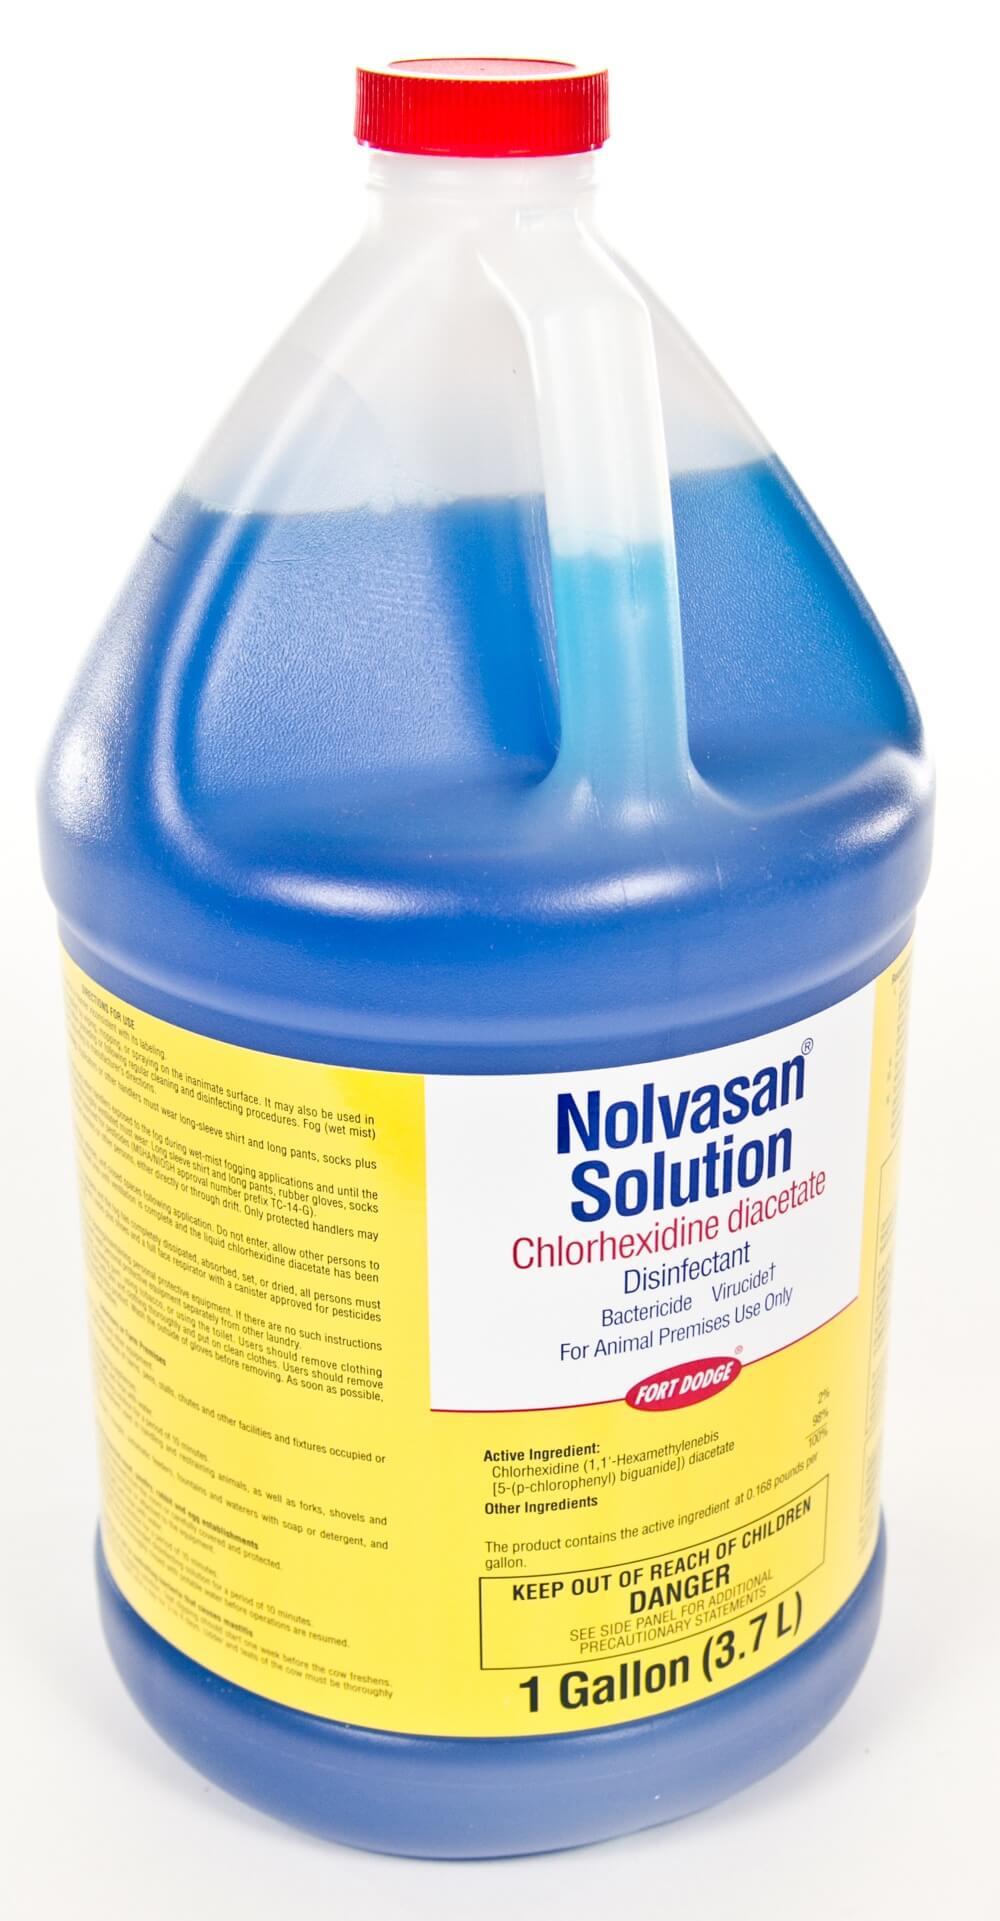 Nolvasan Solution gal 726287106258 | eBay